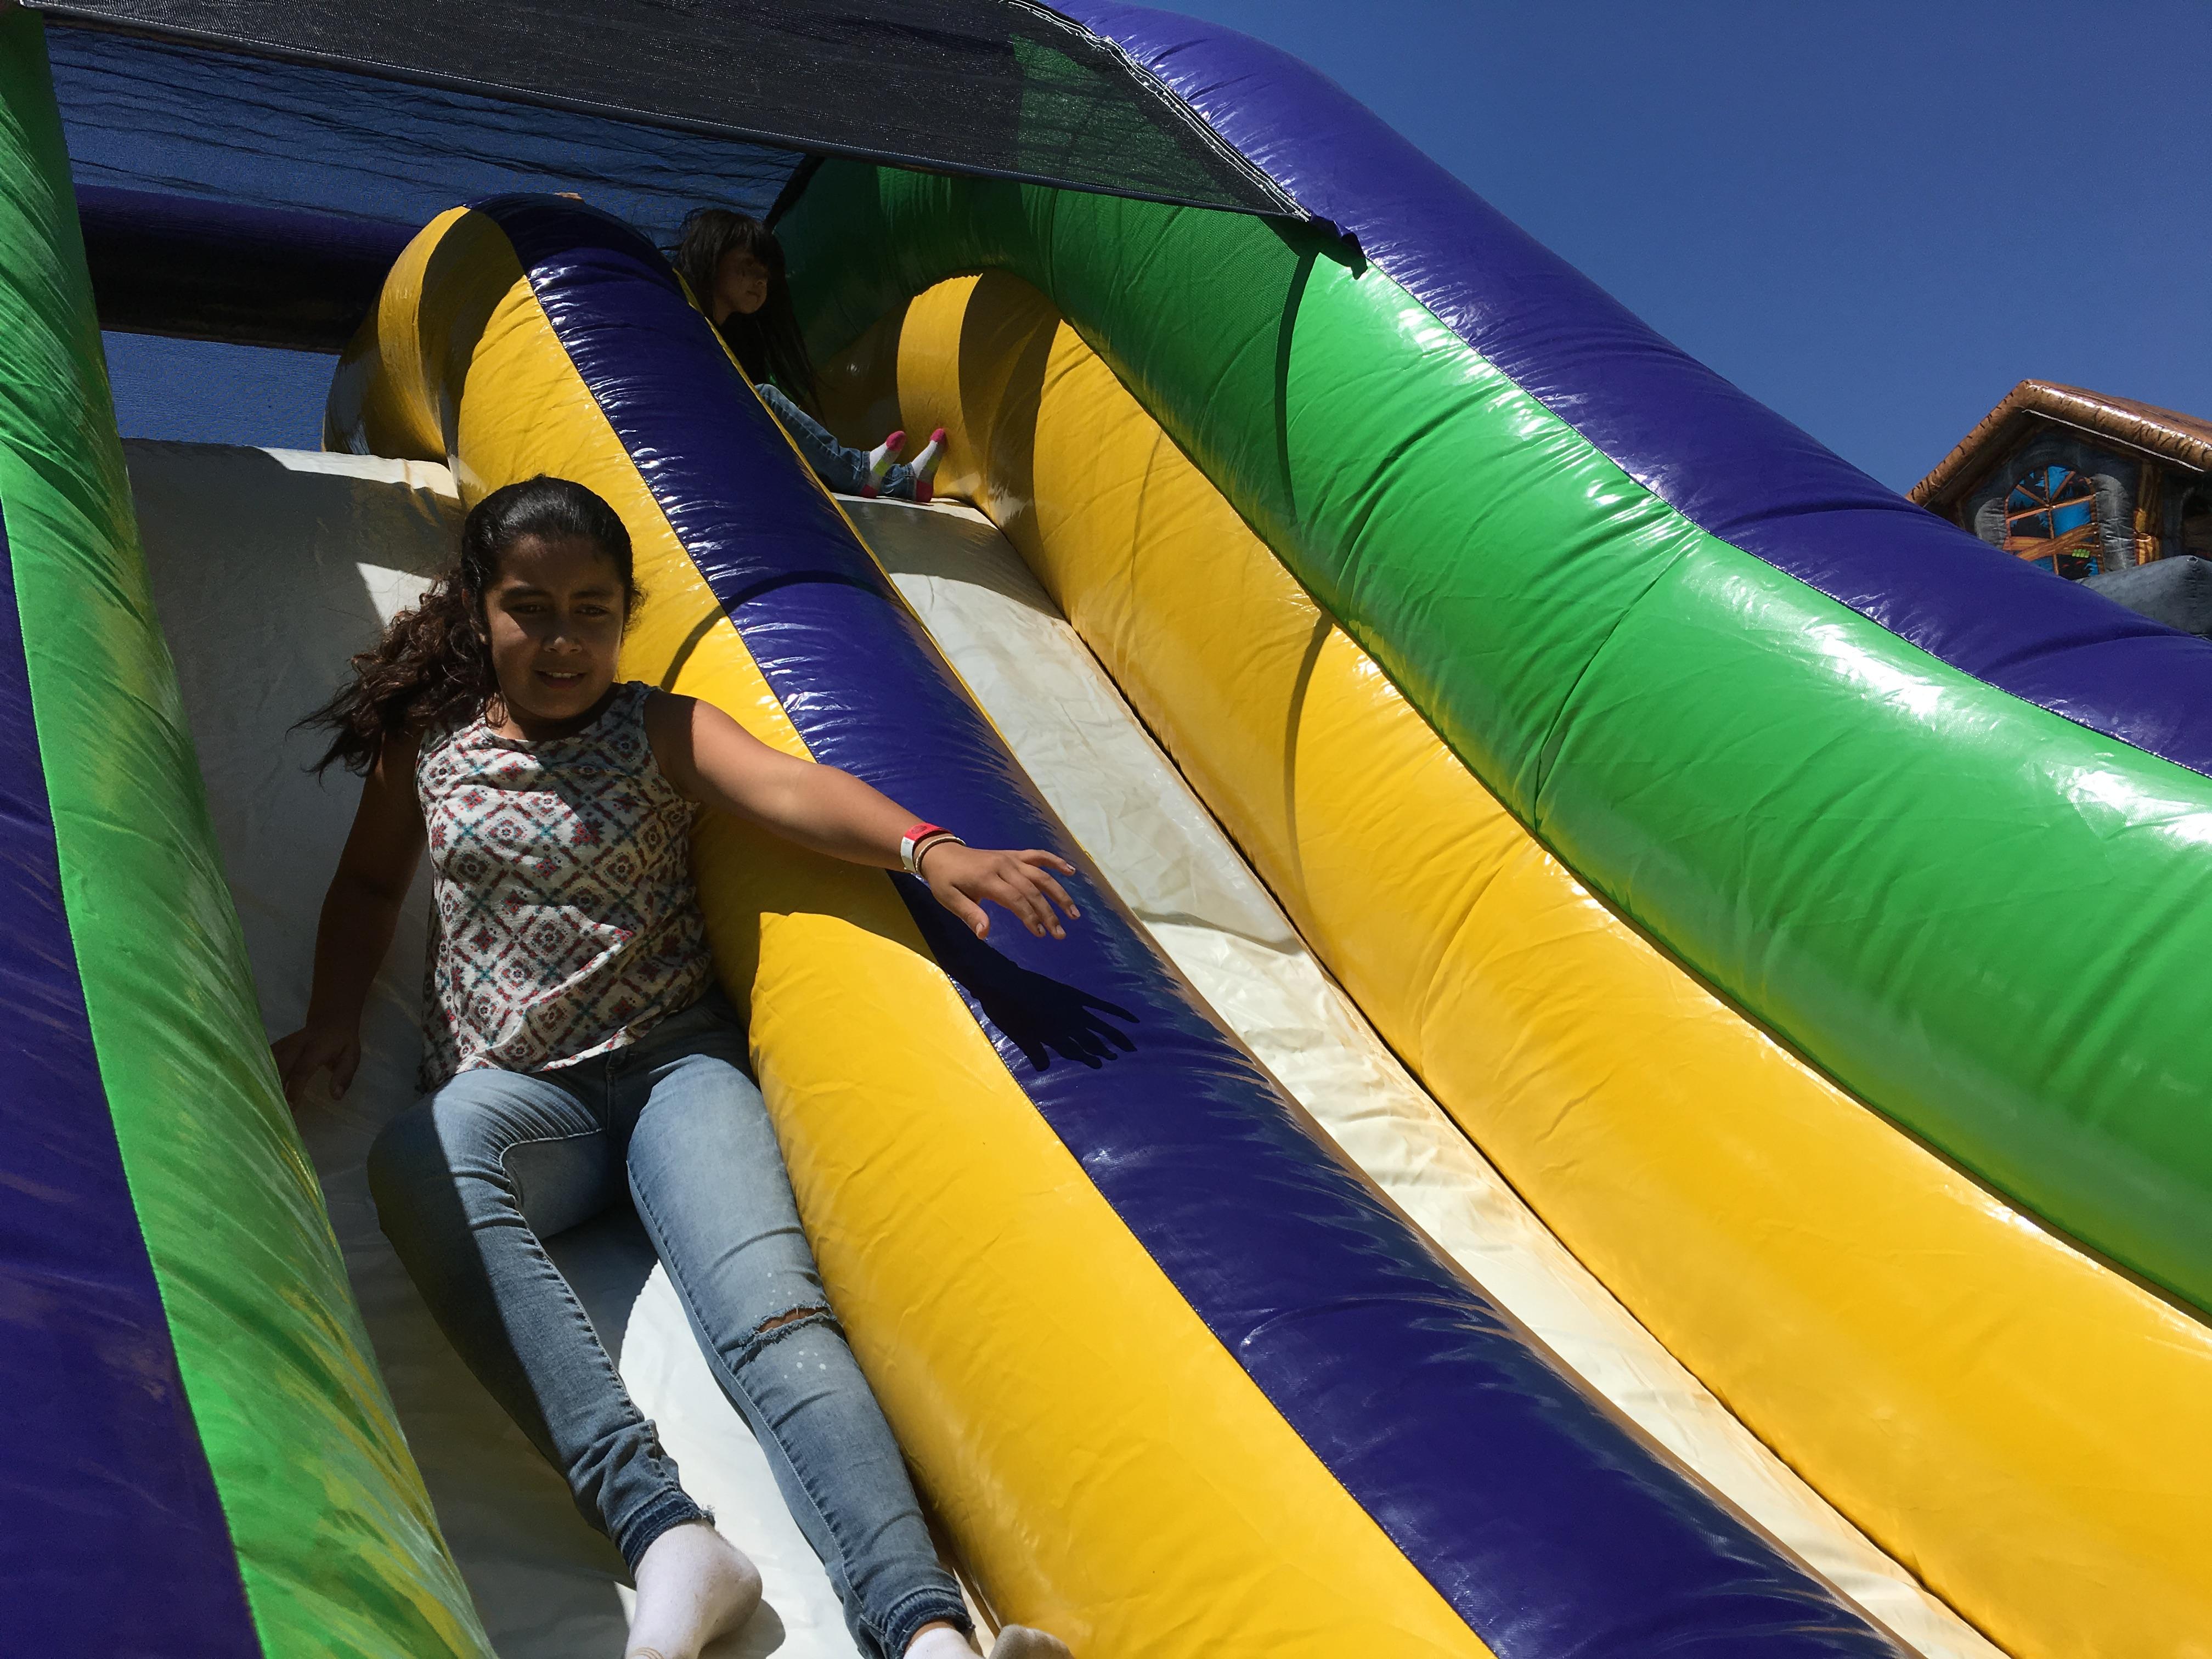 Radical Run Inflatable Rental